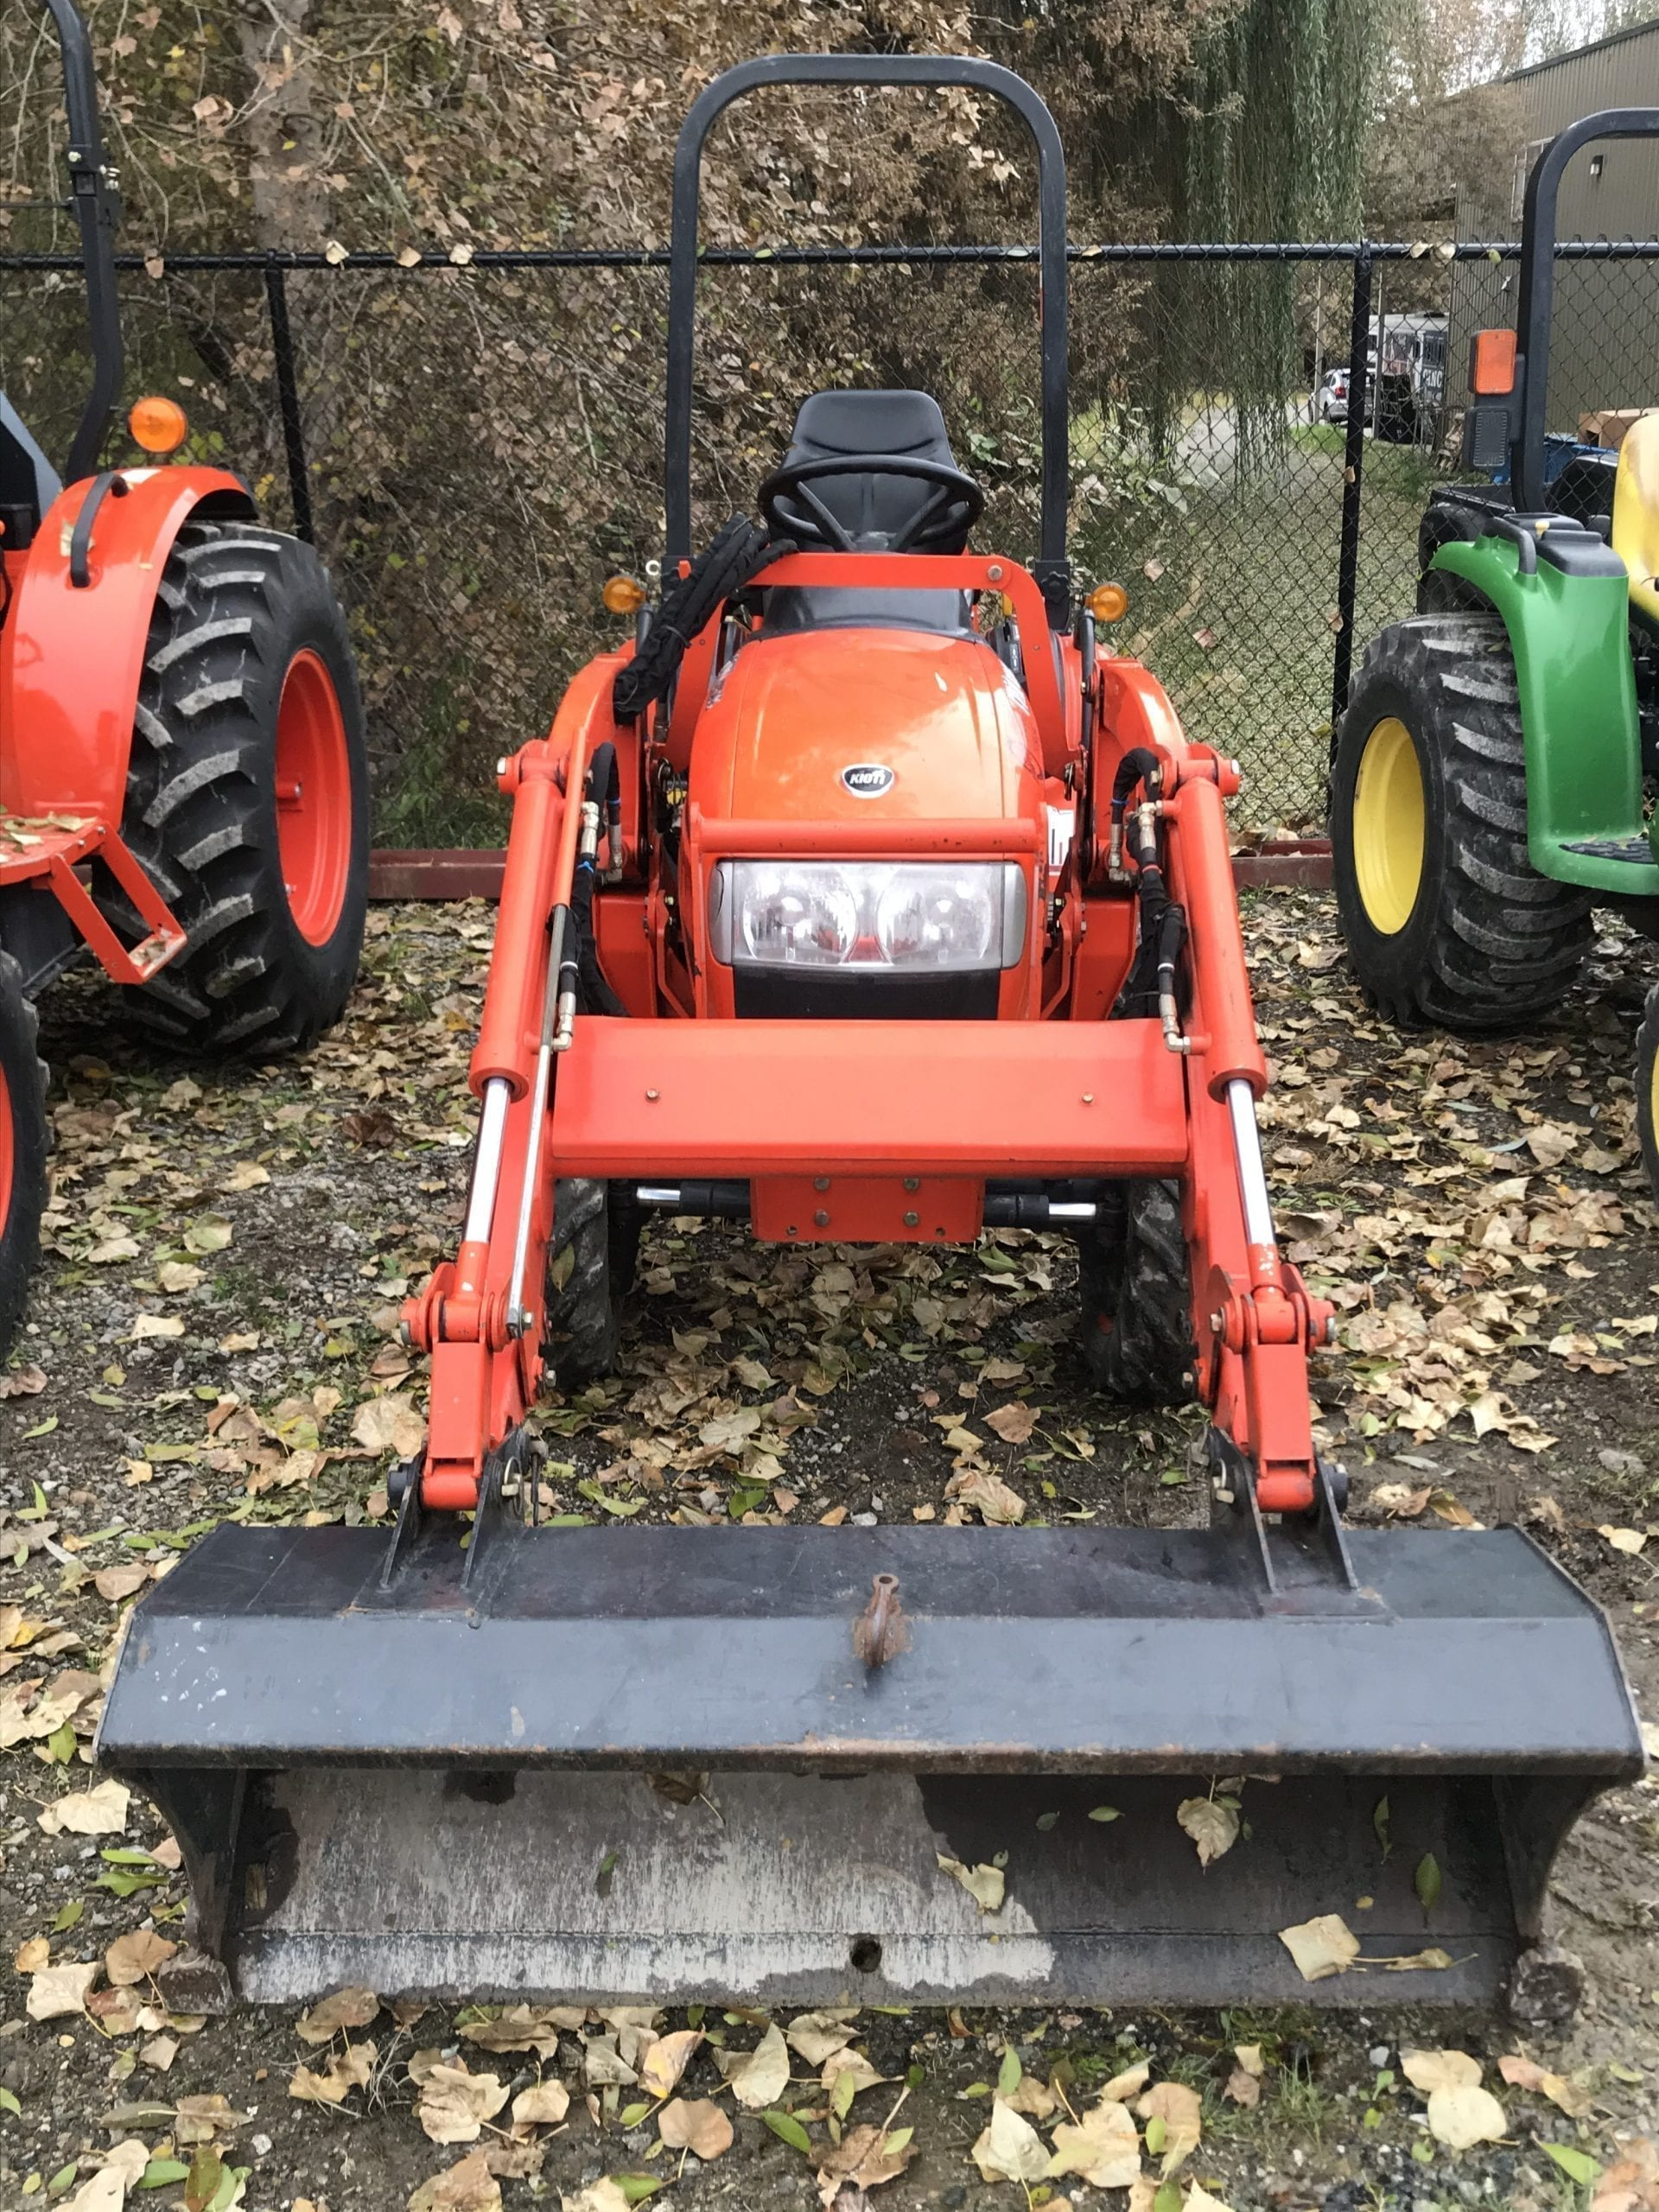 used tractor kelowna